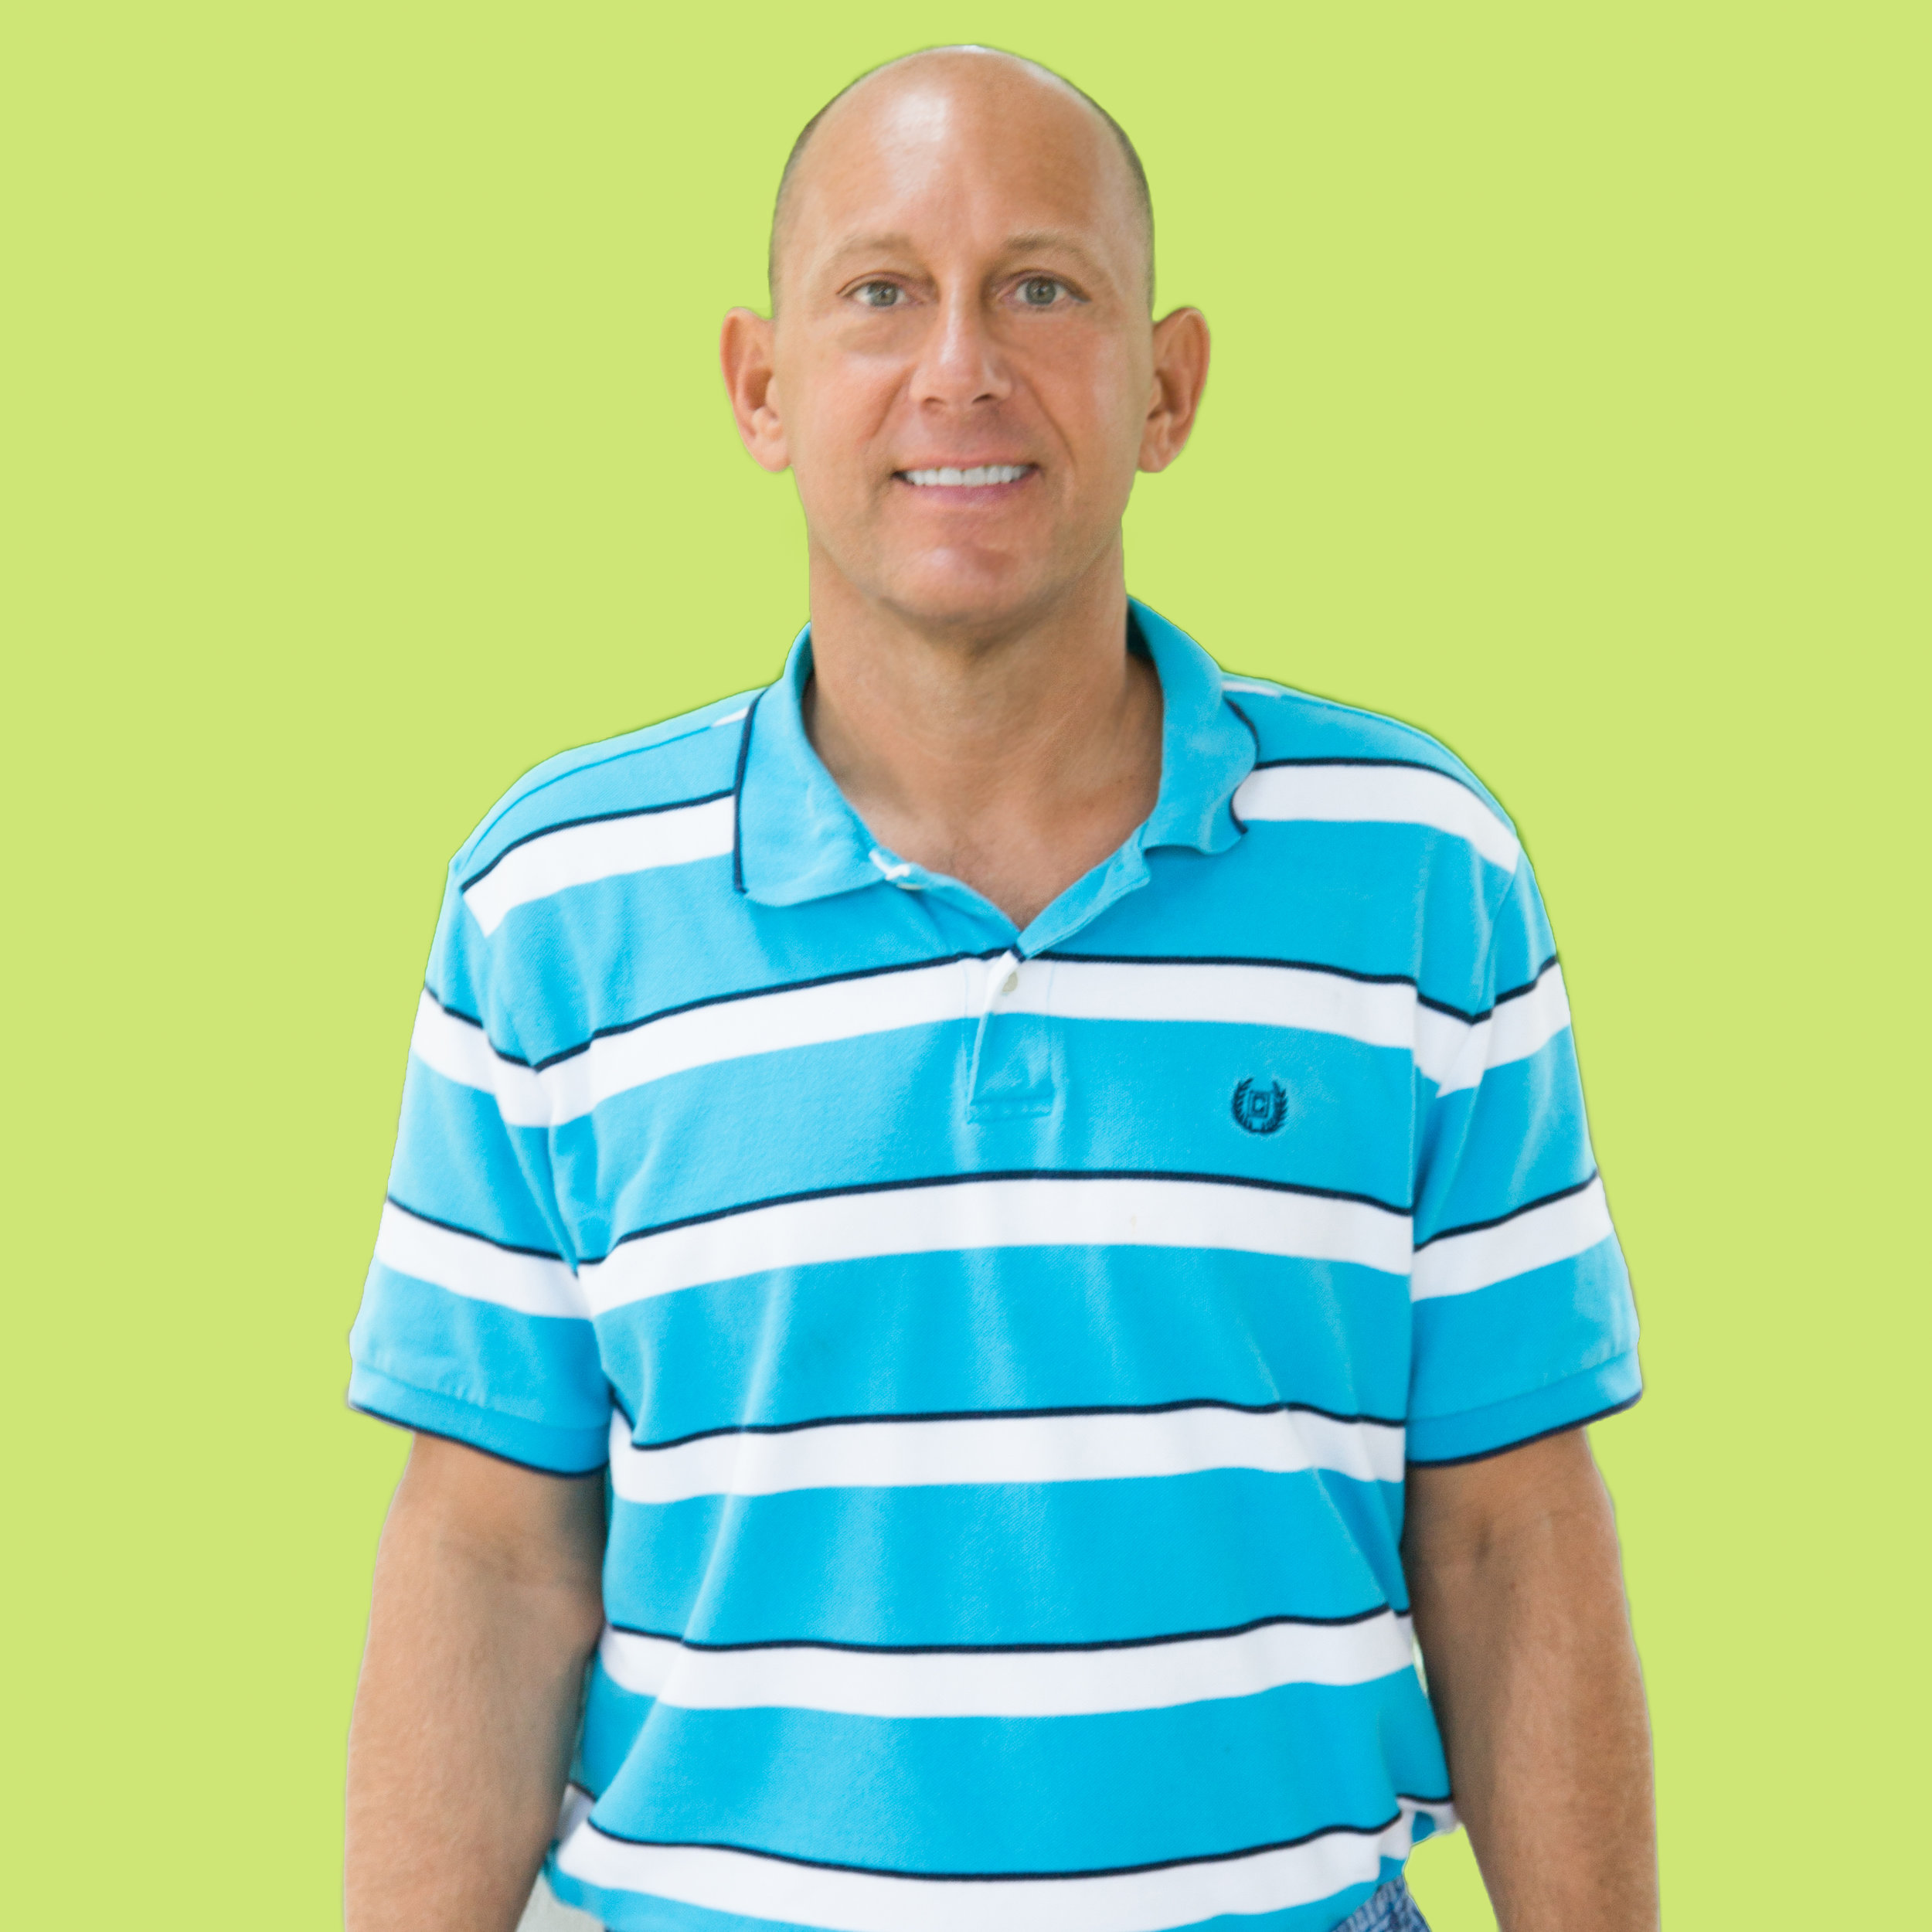 tony bensch | ARea finance manager